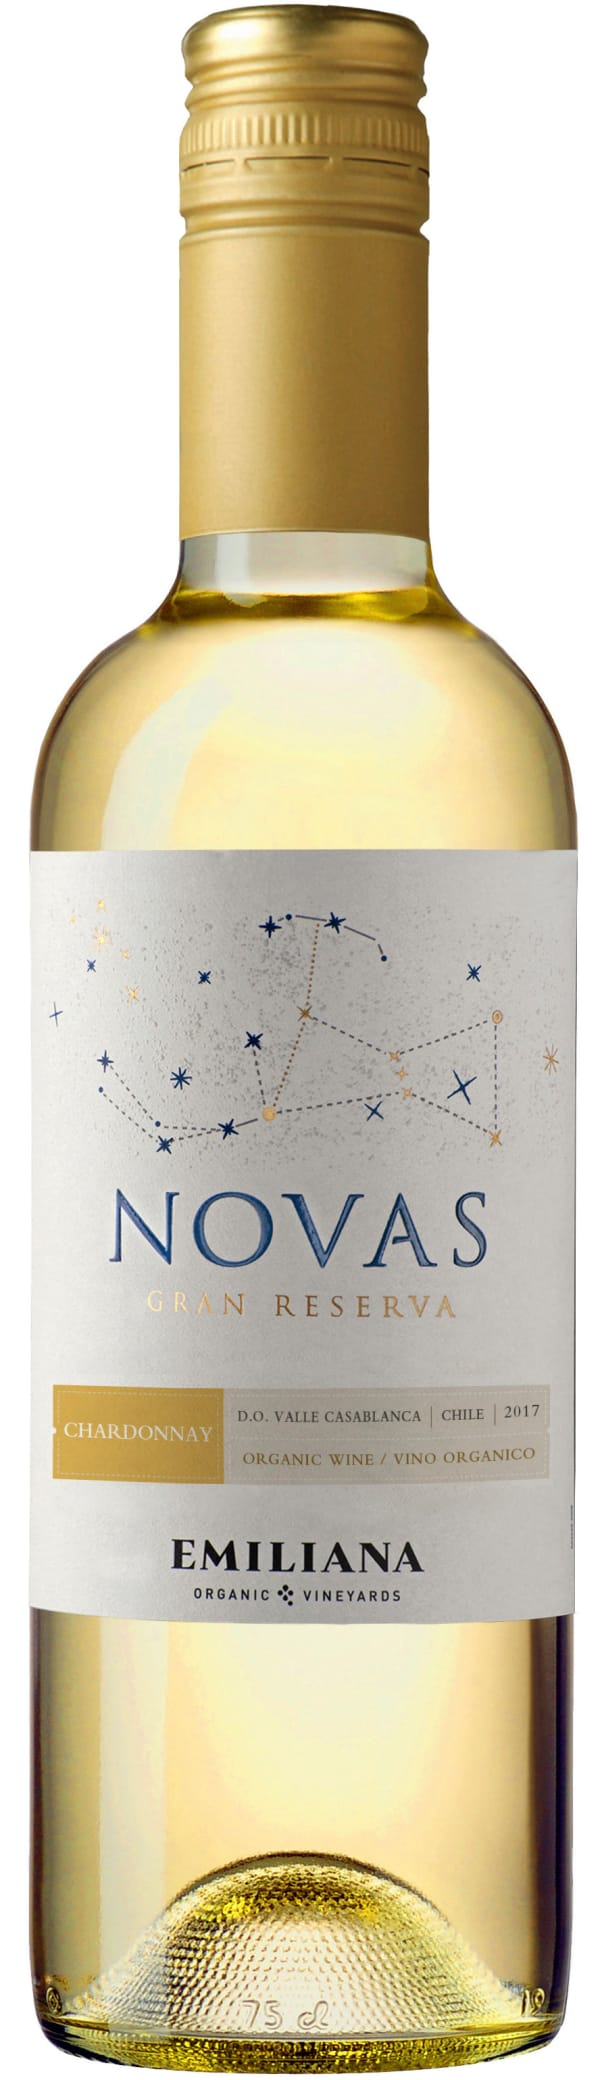 Novas Gran Reserva Chardonnay Organic 2017